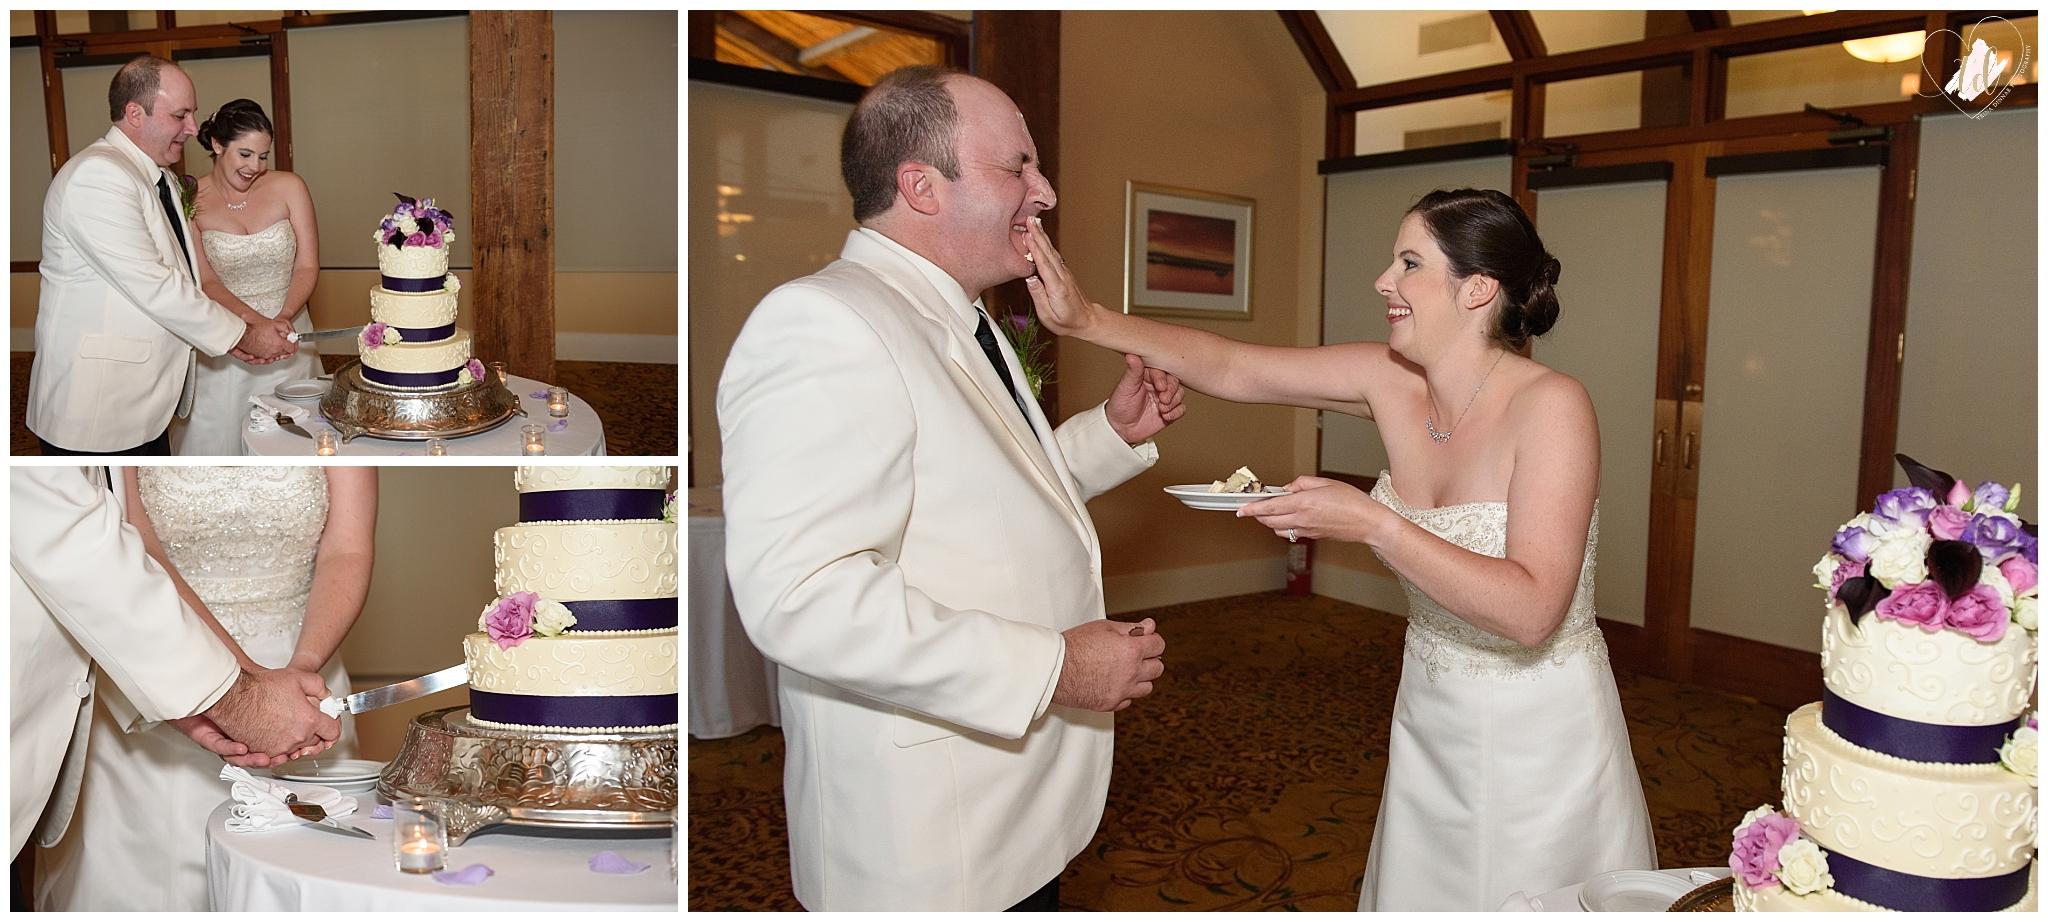 Bride and Groom cutting cake at the Samoset Resort.